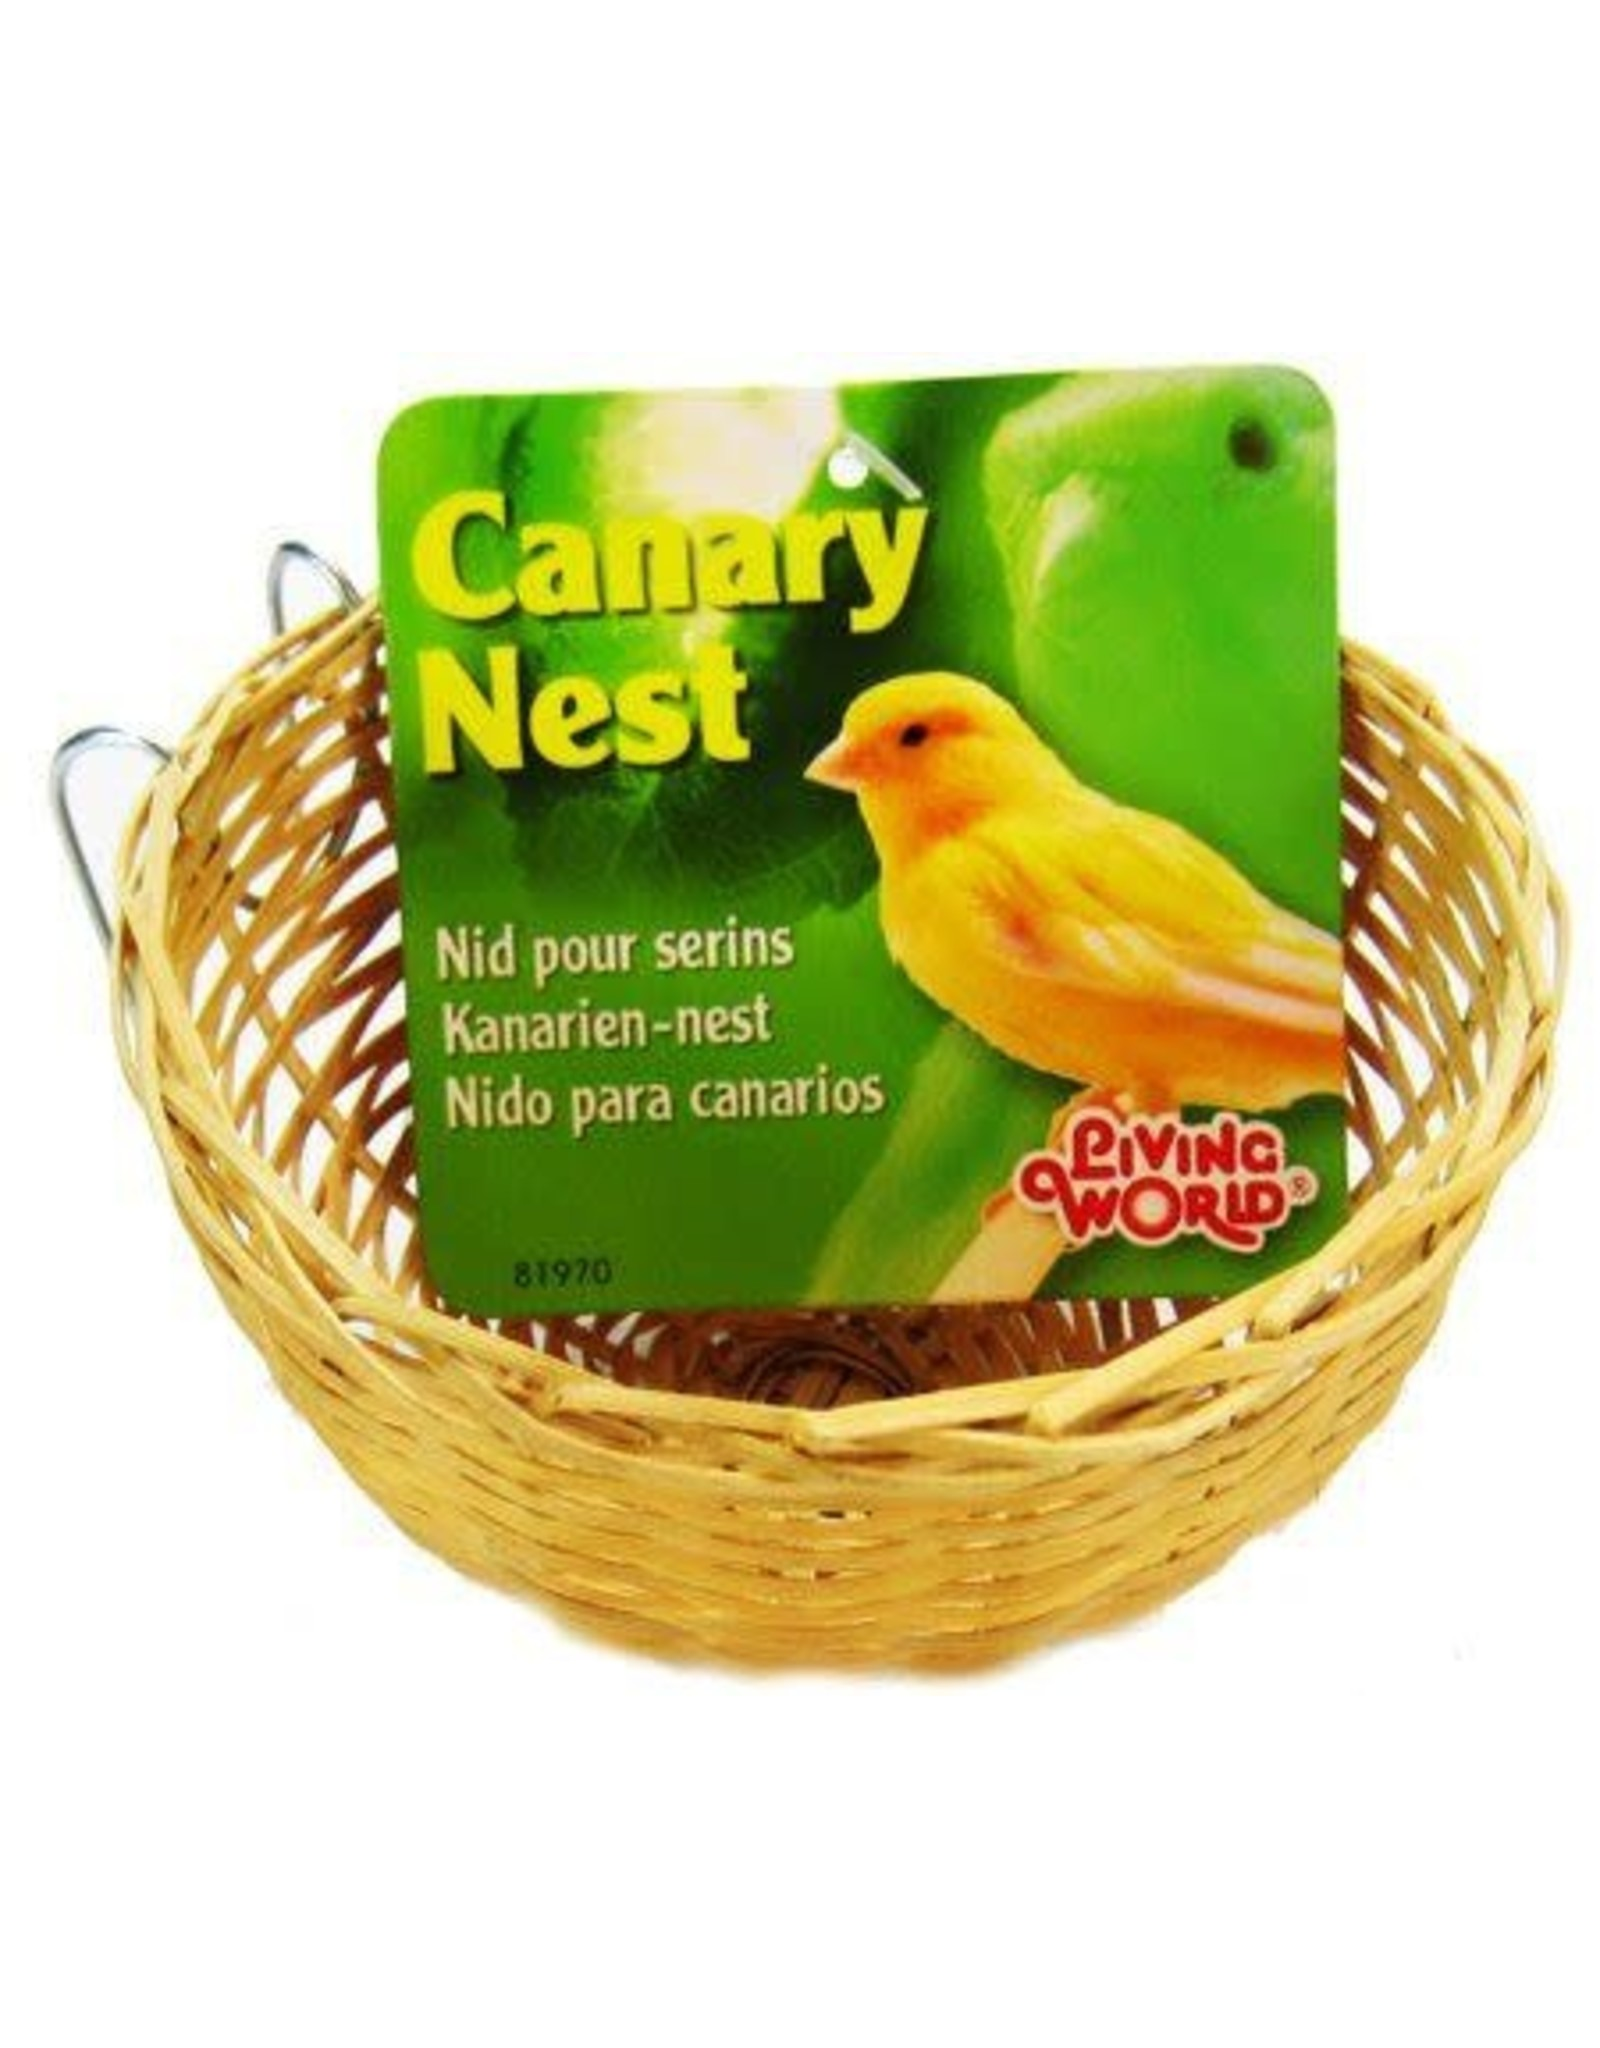 Living World Bamboo Canary Nest